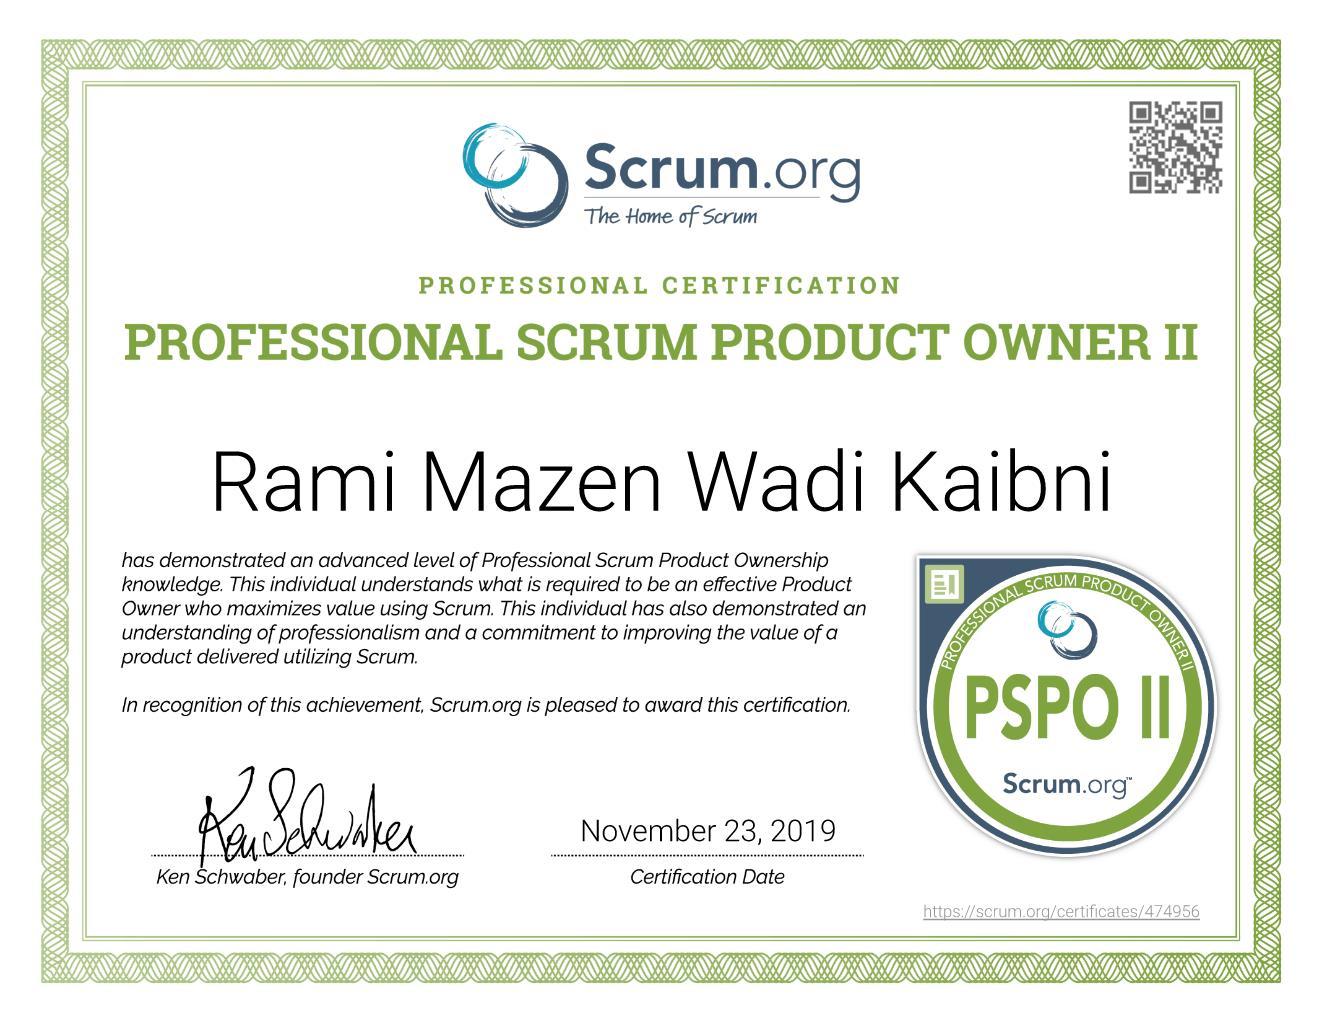 PSPO II Certificate